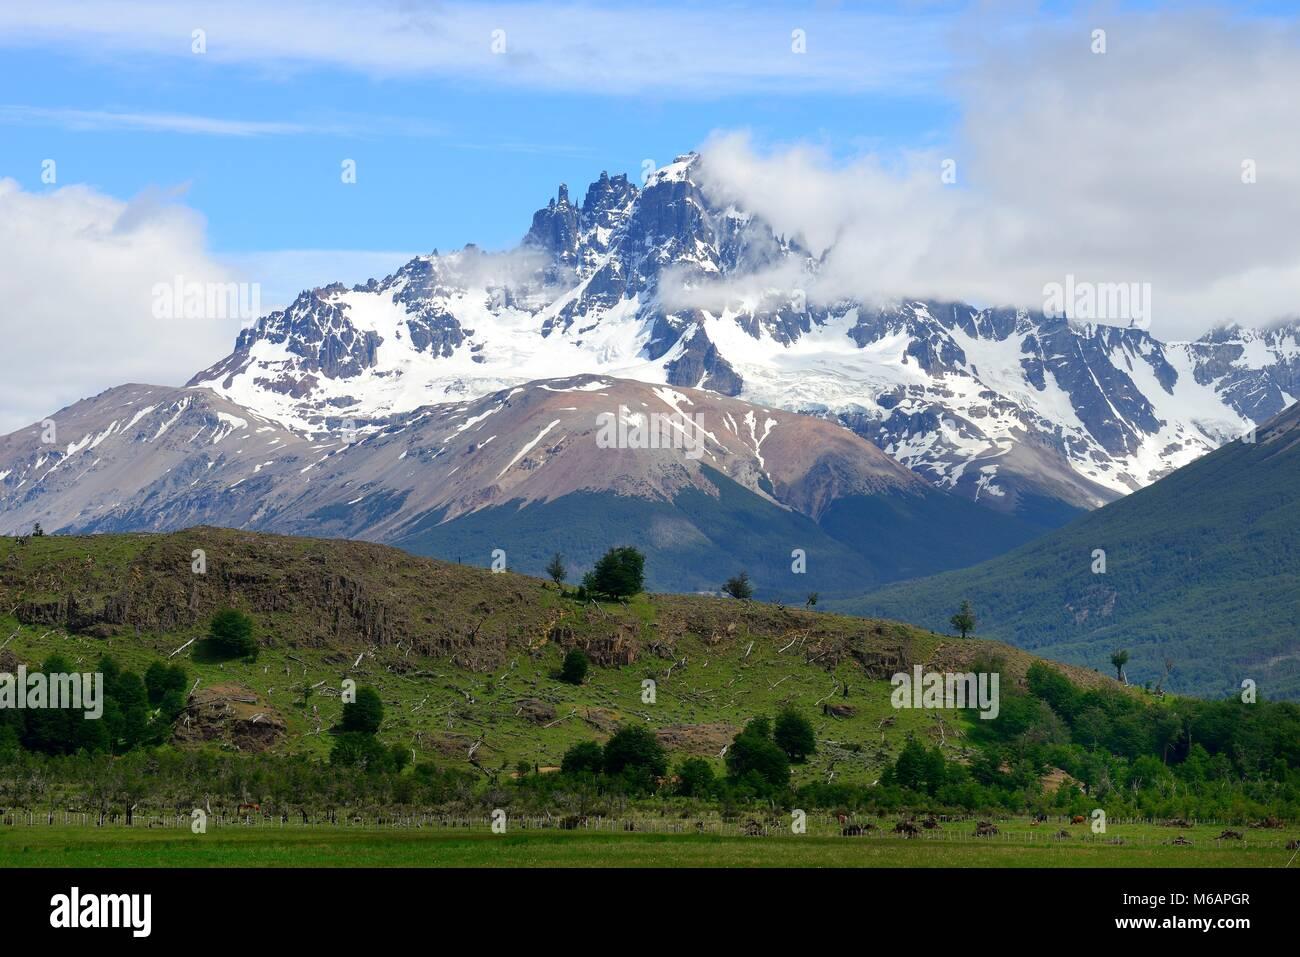 Cerro Castillo with clouds, Carretera Austral, near Villa Cerra Castillo, XI., Región de Aisén, Chile - Stock Image